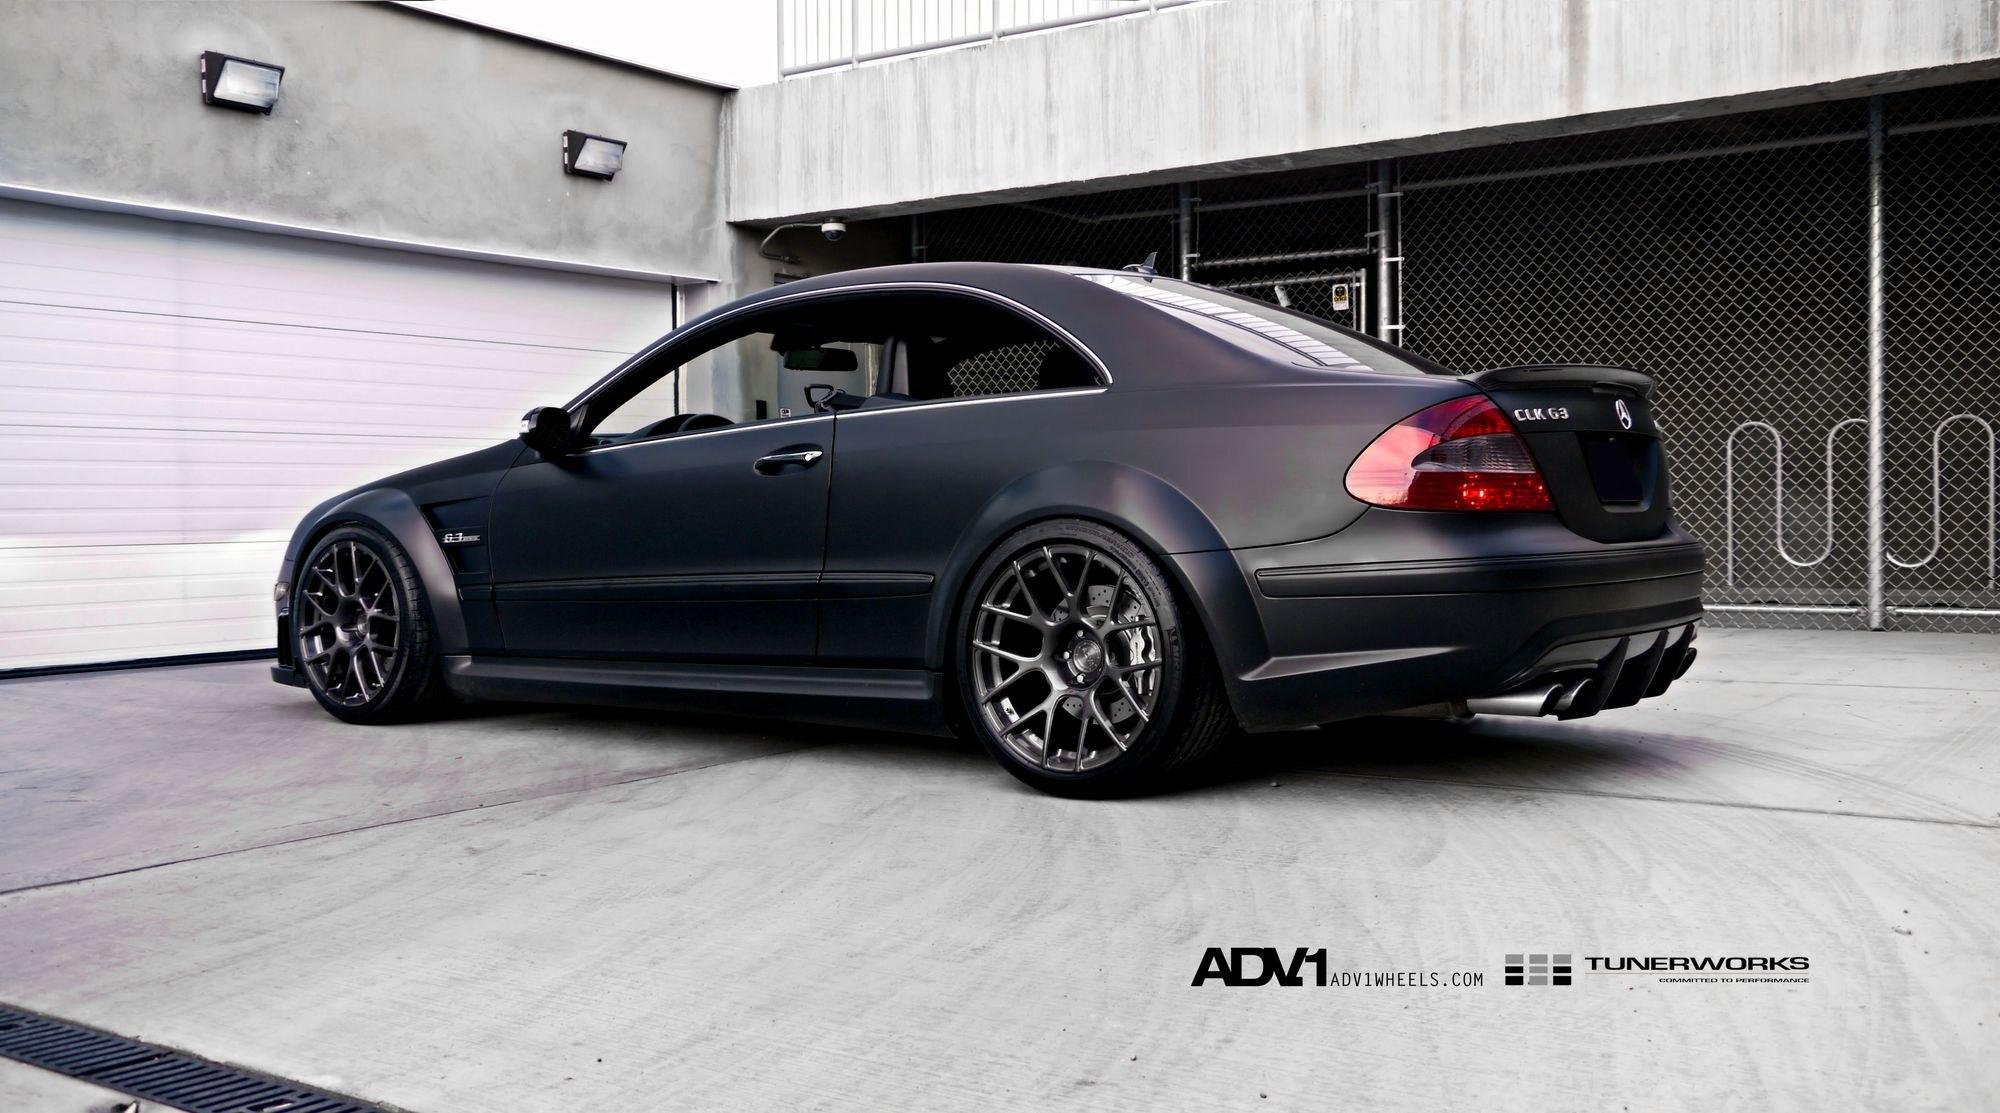 German Muscle Car Mercedes Clk63 Black Edition Carid Com Gallery